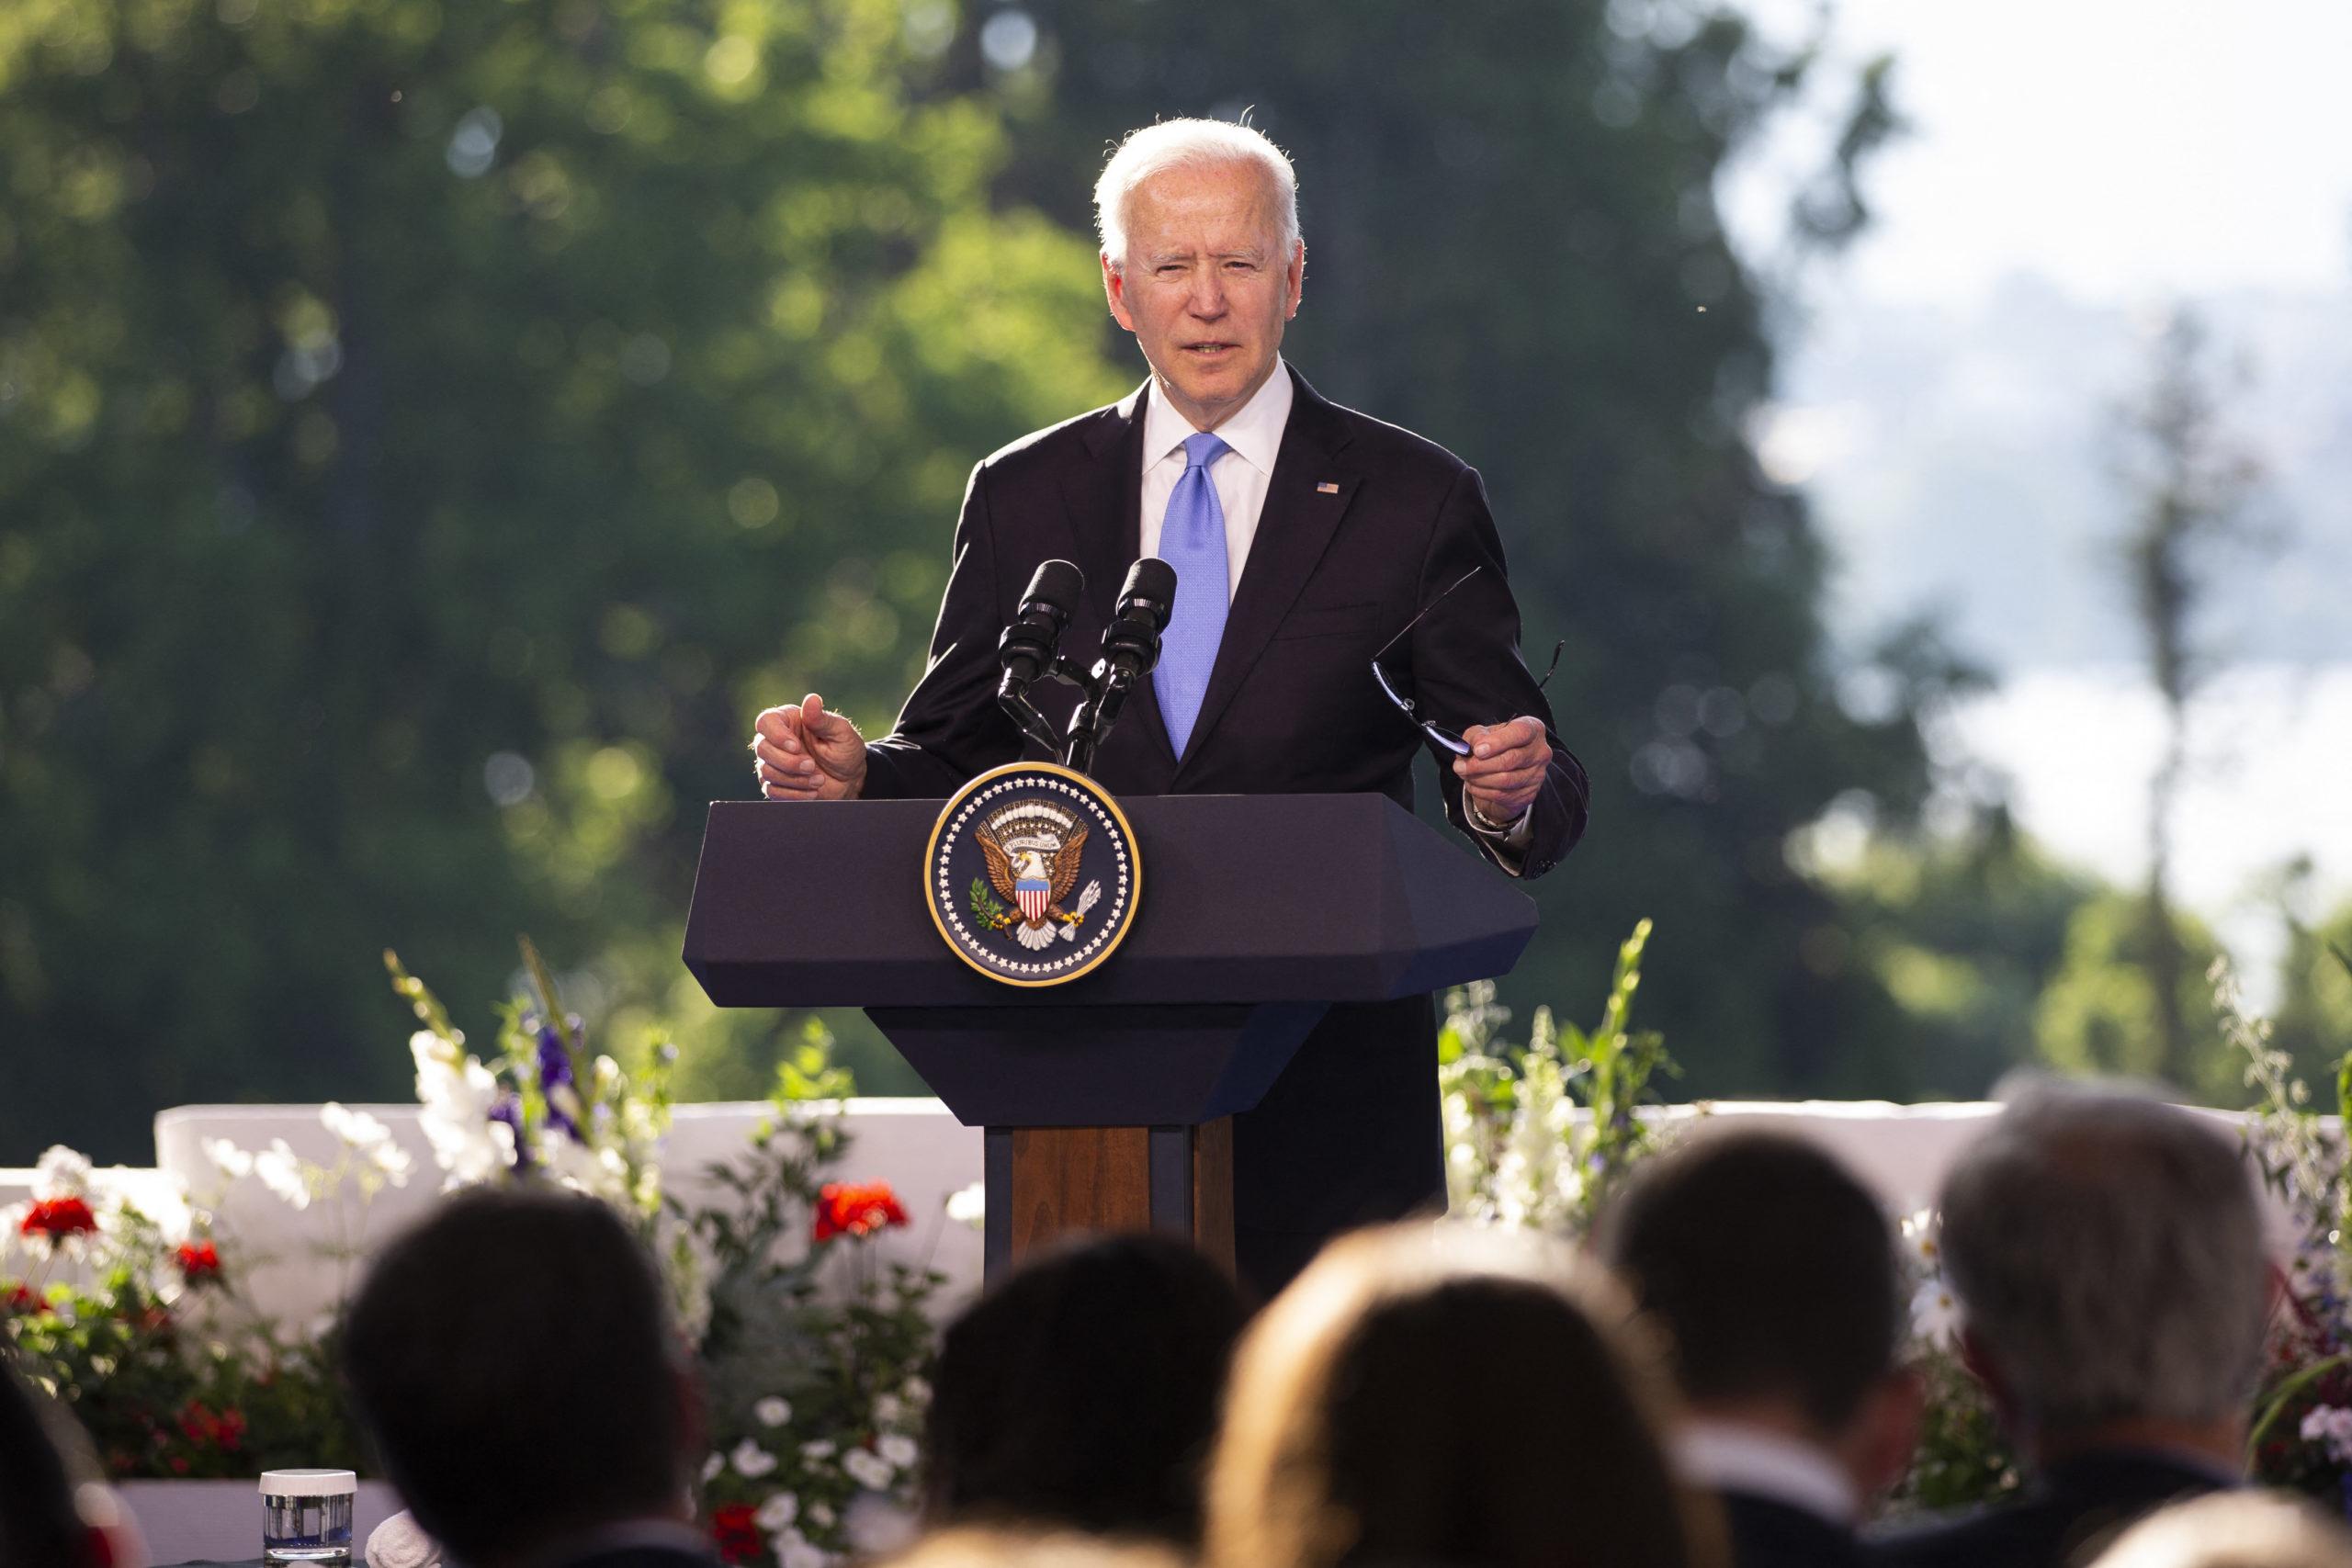 President Joe Biden holds a press conference in Geneva, Switzerland on Wednesday. (Peter Klaunzer/Pool/AFP via Getty Images)